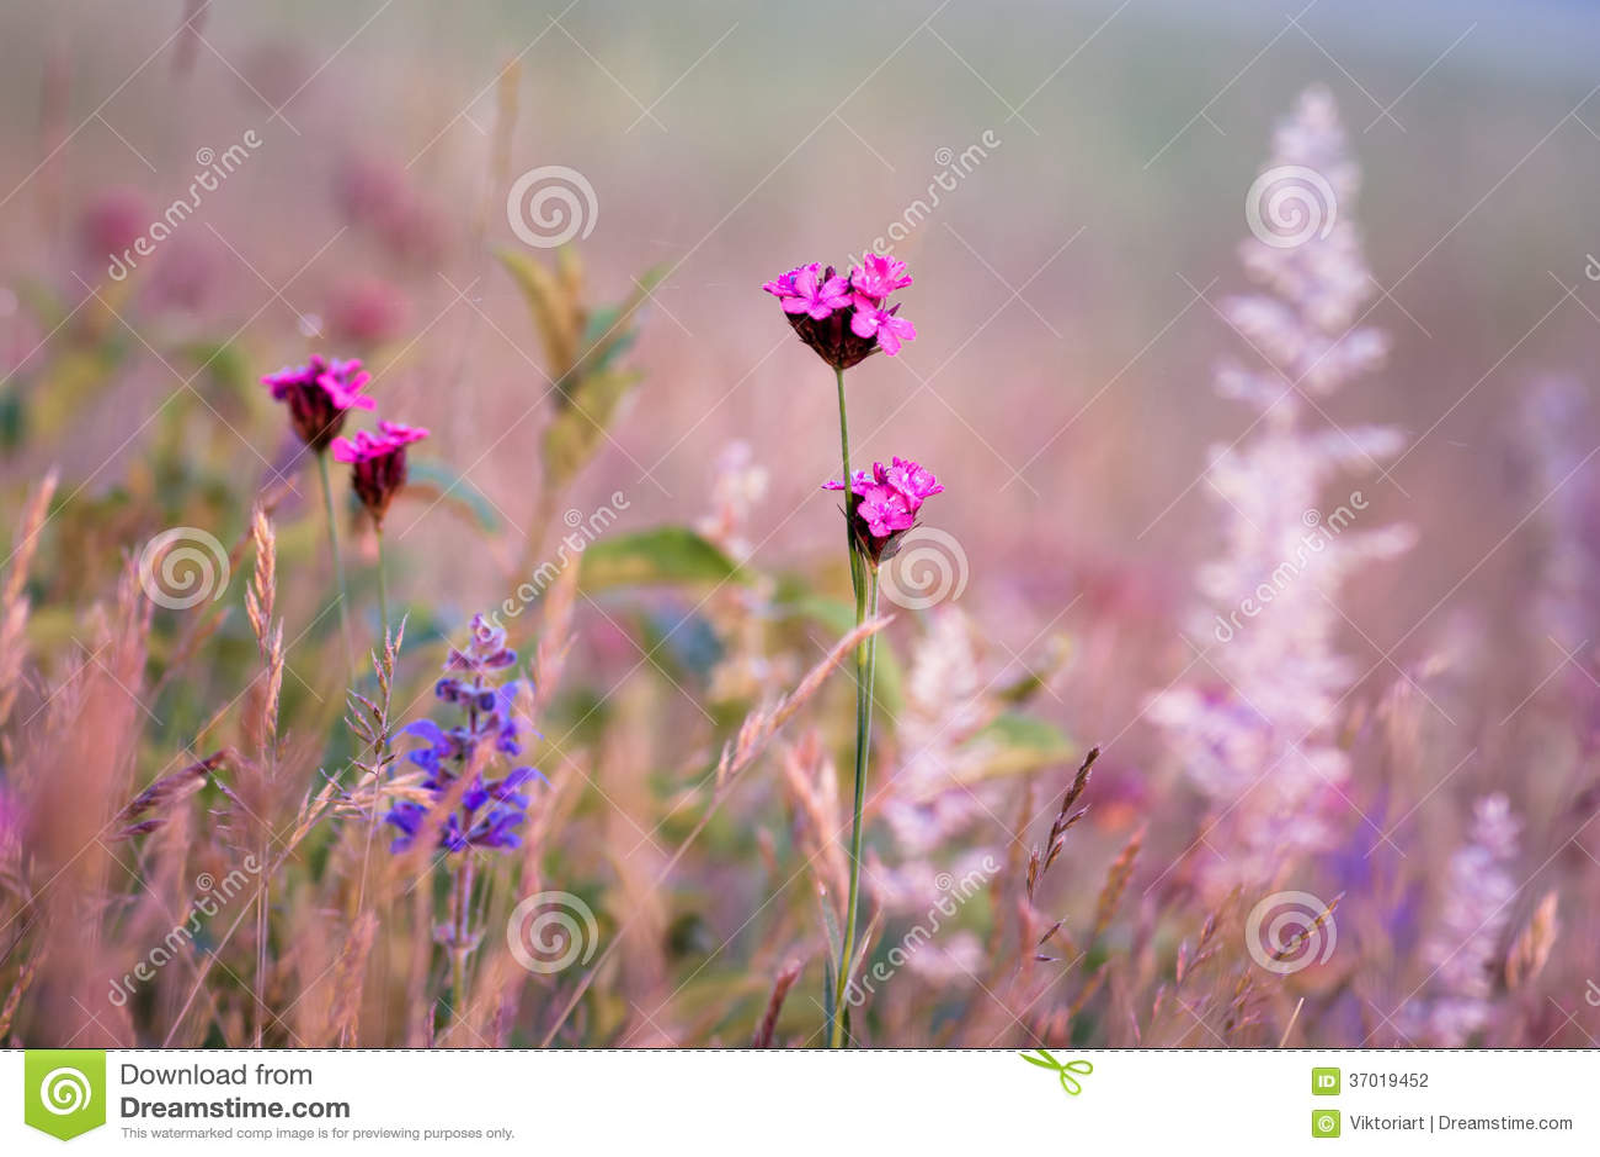 Pink and purple wildflowers stock photo image of morning blooming pink and purple wildflowers mightylinksfo